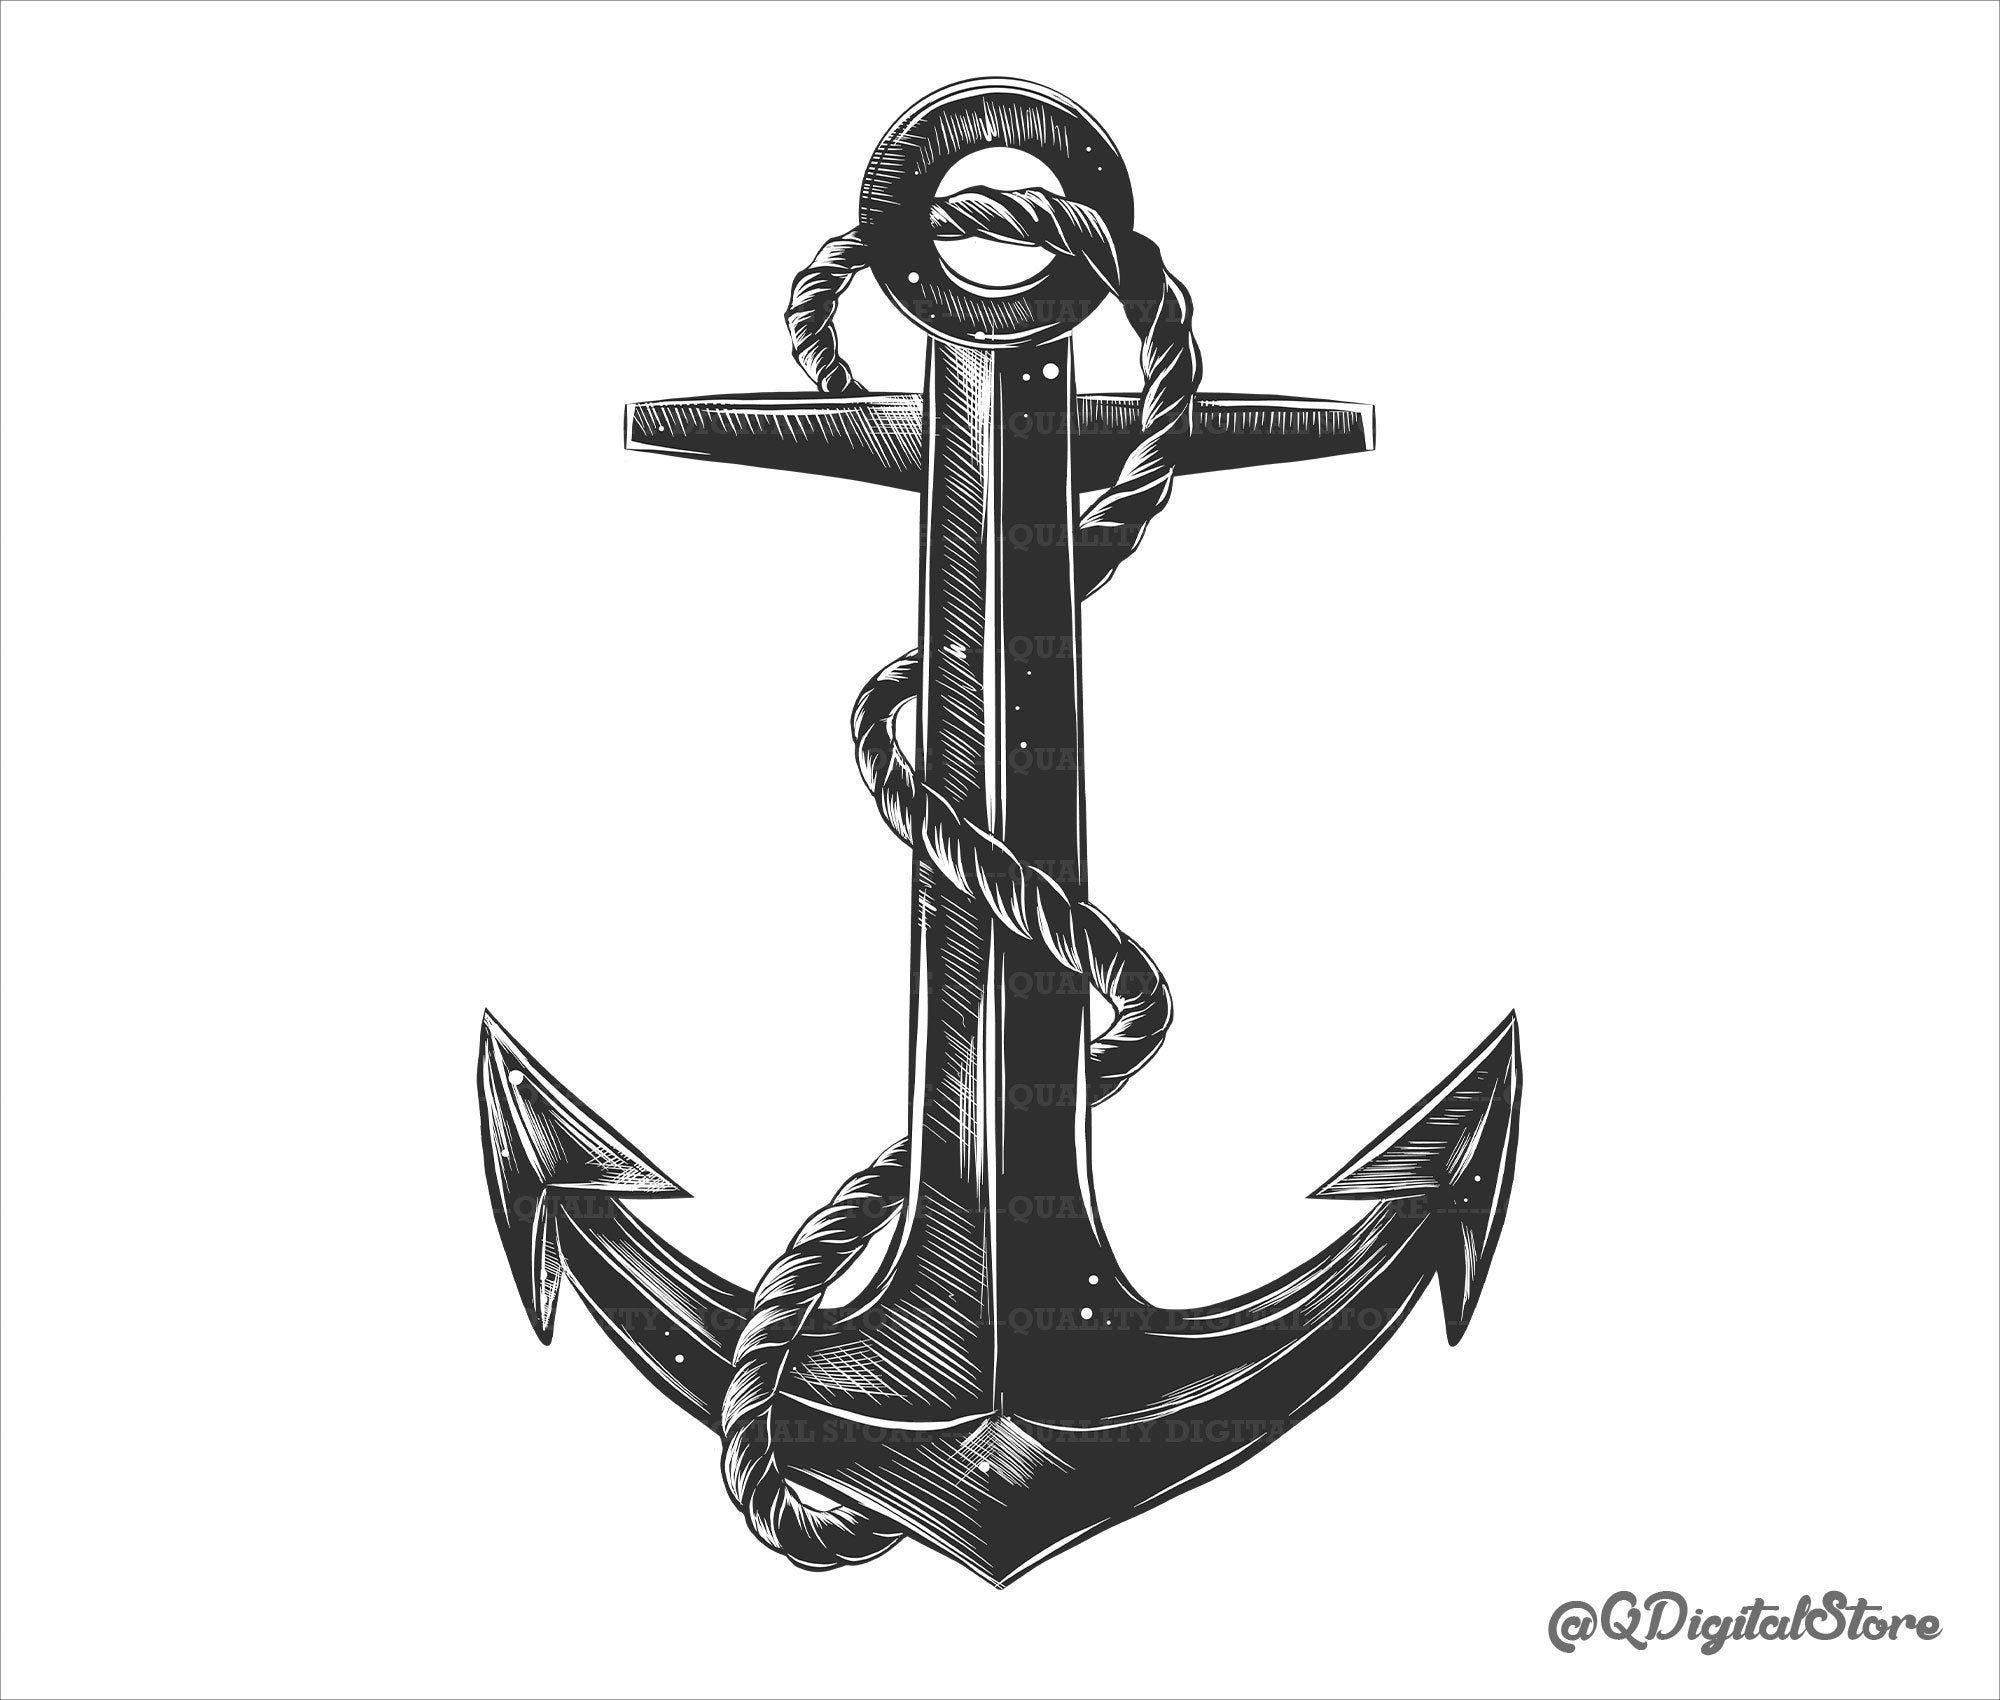 Anchor Svg Anchor Vector Anchor Digital Download Anchor T Shirt Design Png Eps Svg Psd Ai In 2021 Anchor Drawings Navy Anchor Tattoos Anchor Tattoo Men